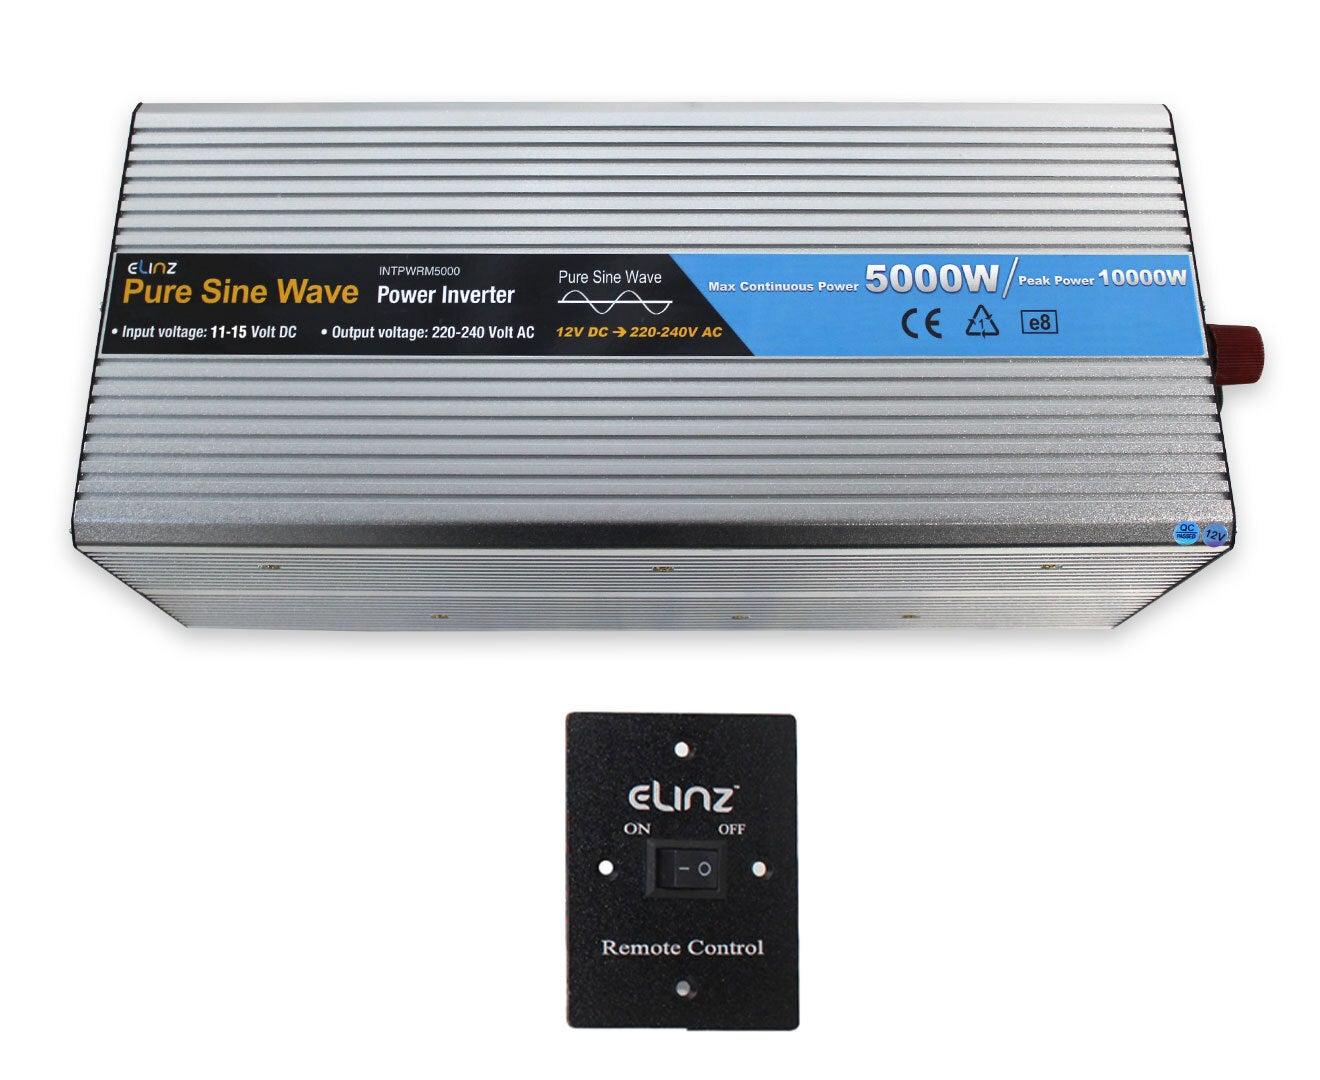 Elinz 5000W/10000W Pure Sine Wave Power Inverter 12V-240V AUS Plug Remote Control